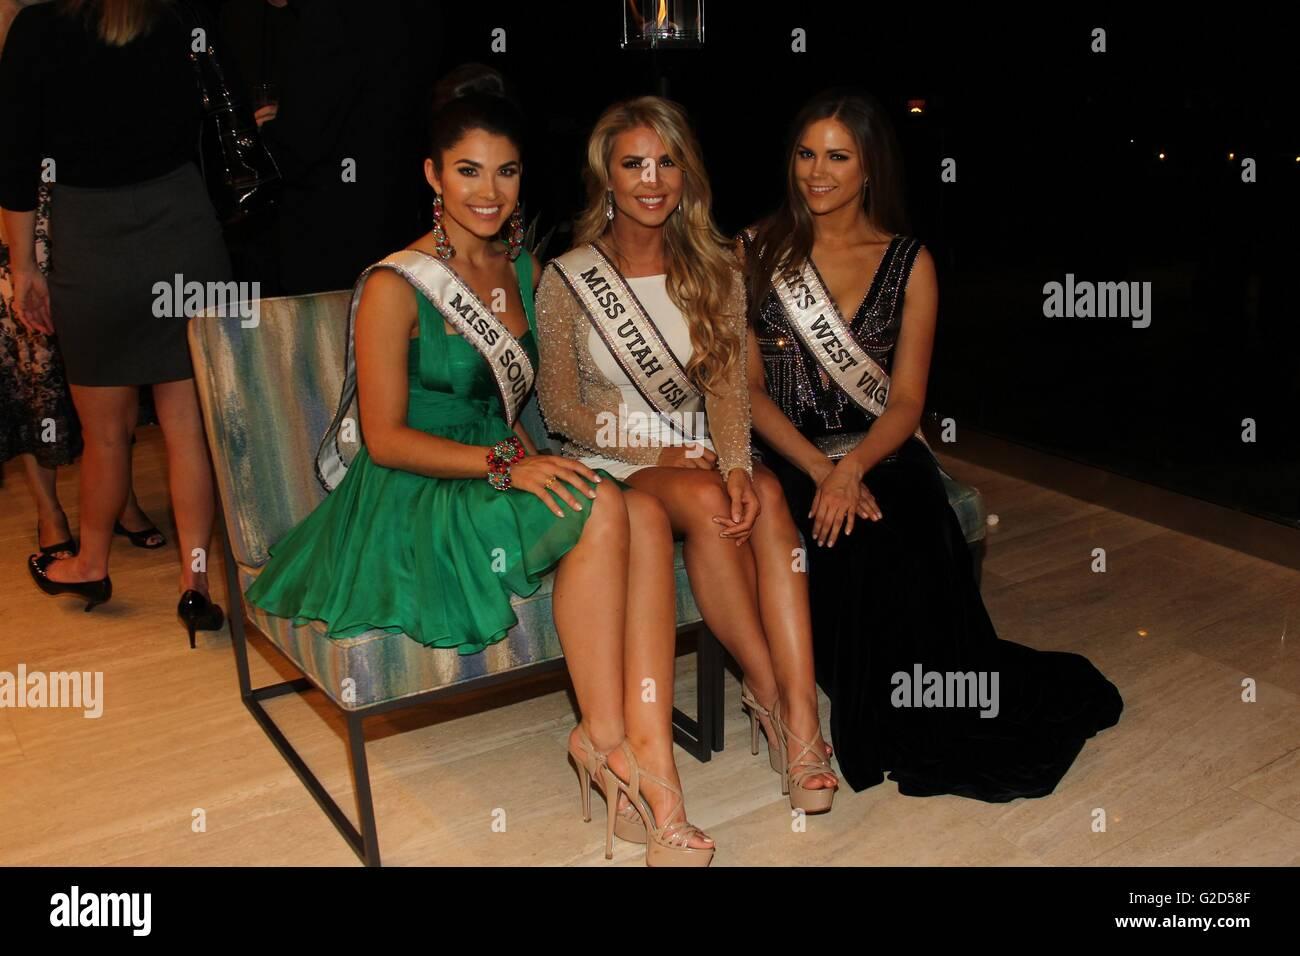 Henderson, NV, USA. 27th May, 2016. Miss South Carolina USA, Leah Lawson, Miss Utah USA, Teale Murdock, Miss West - Stock Image